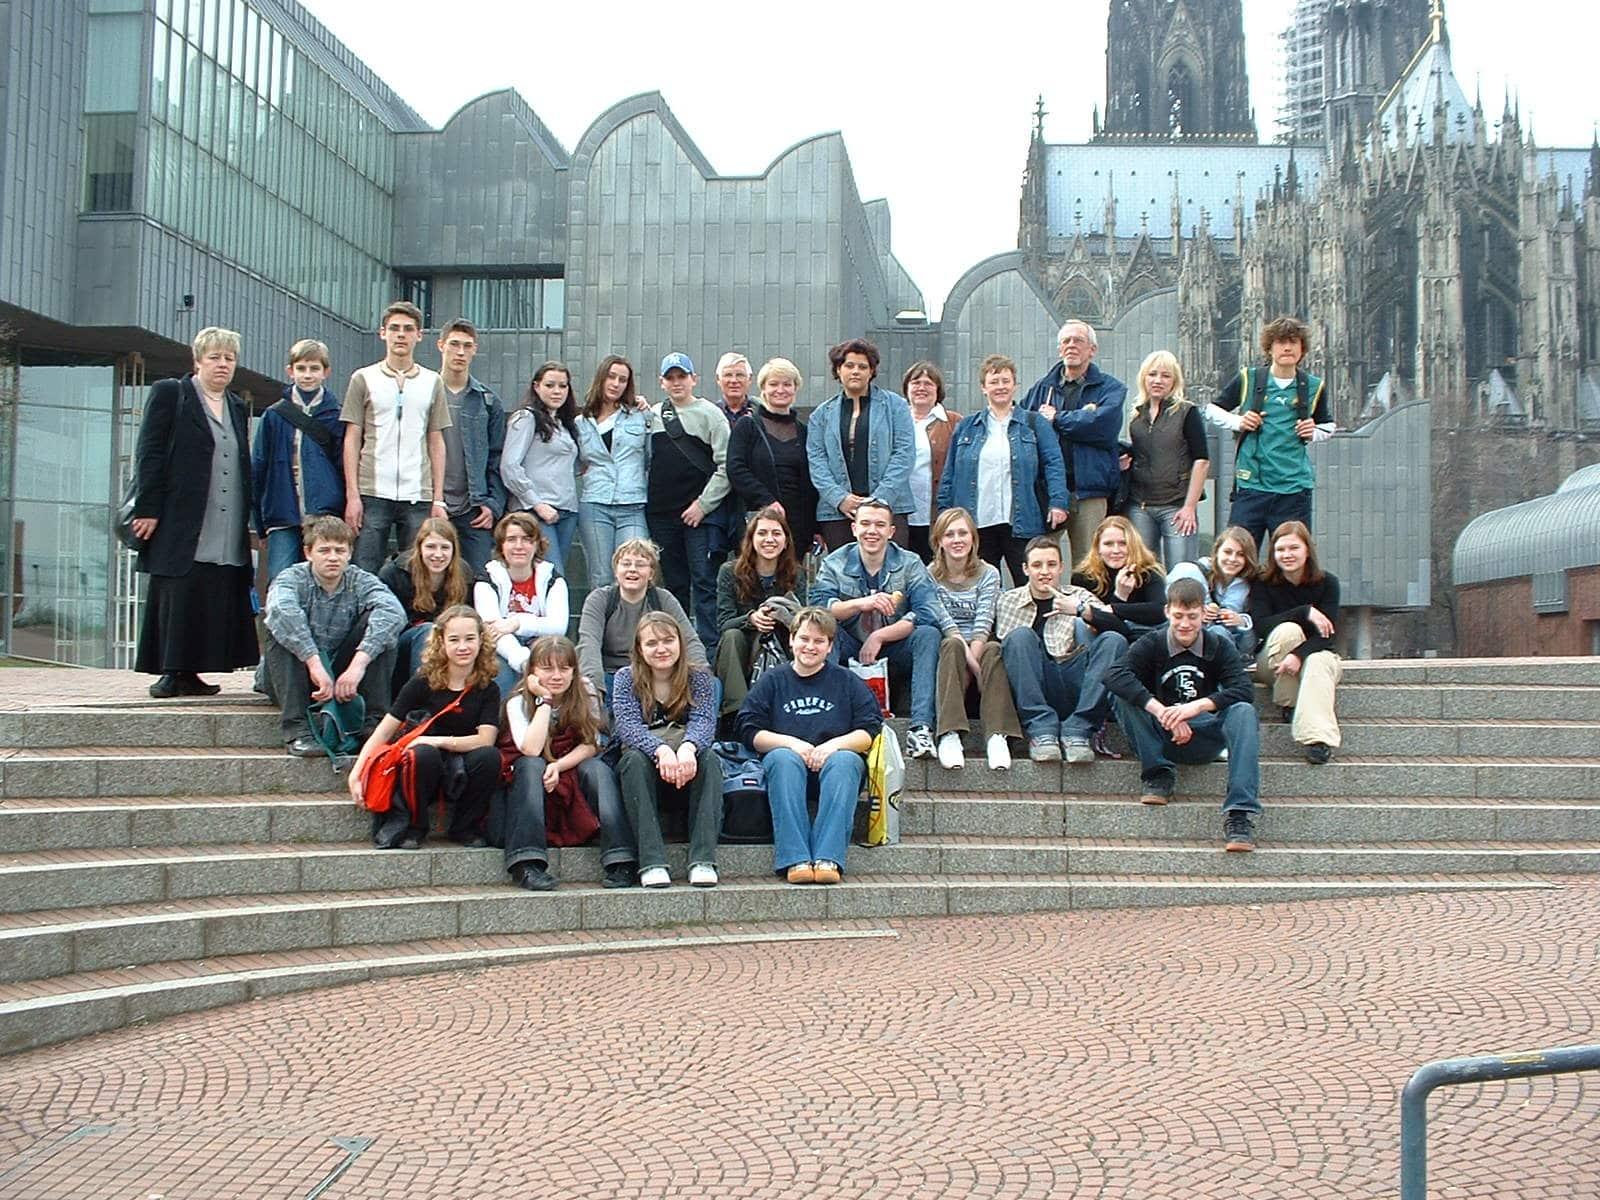 Zehn Schüler aus Kiew erkunden die Ruhrstadt